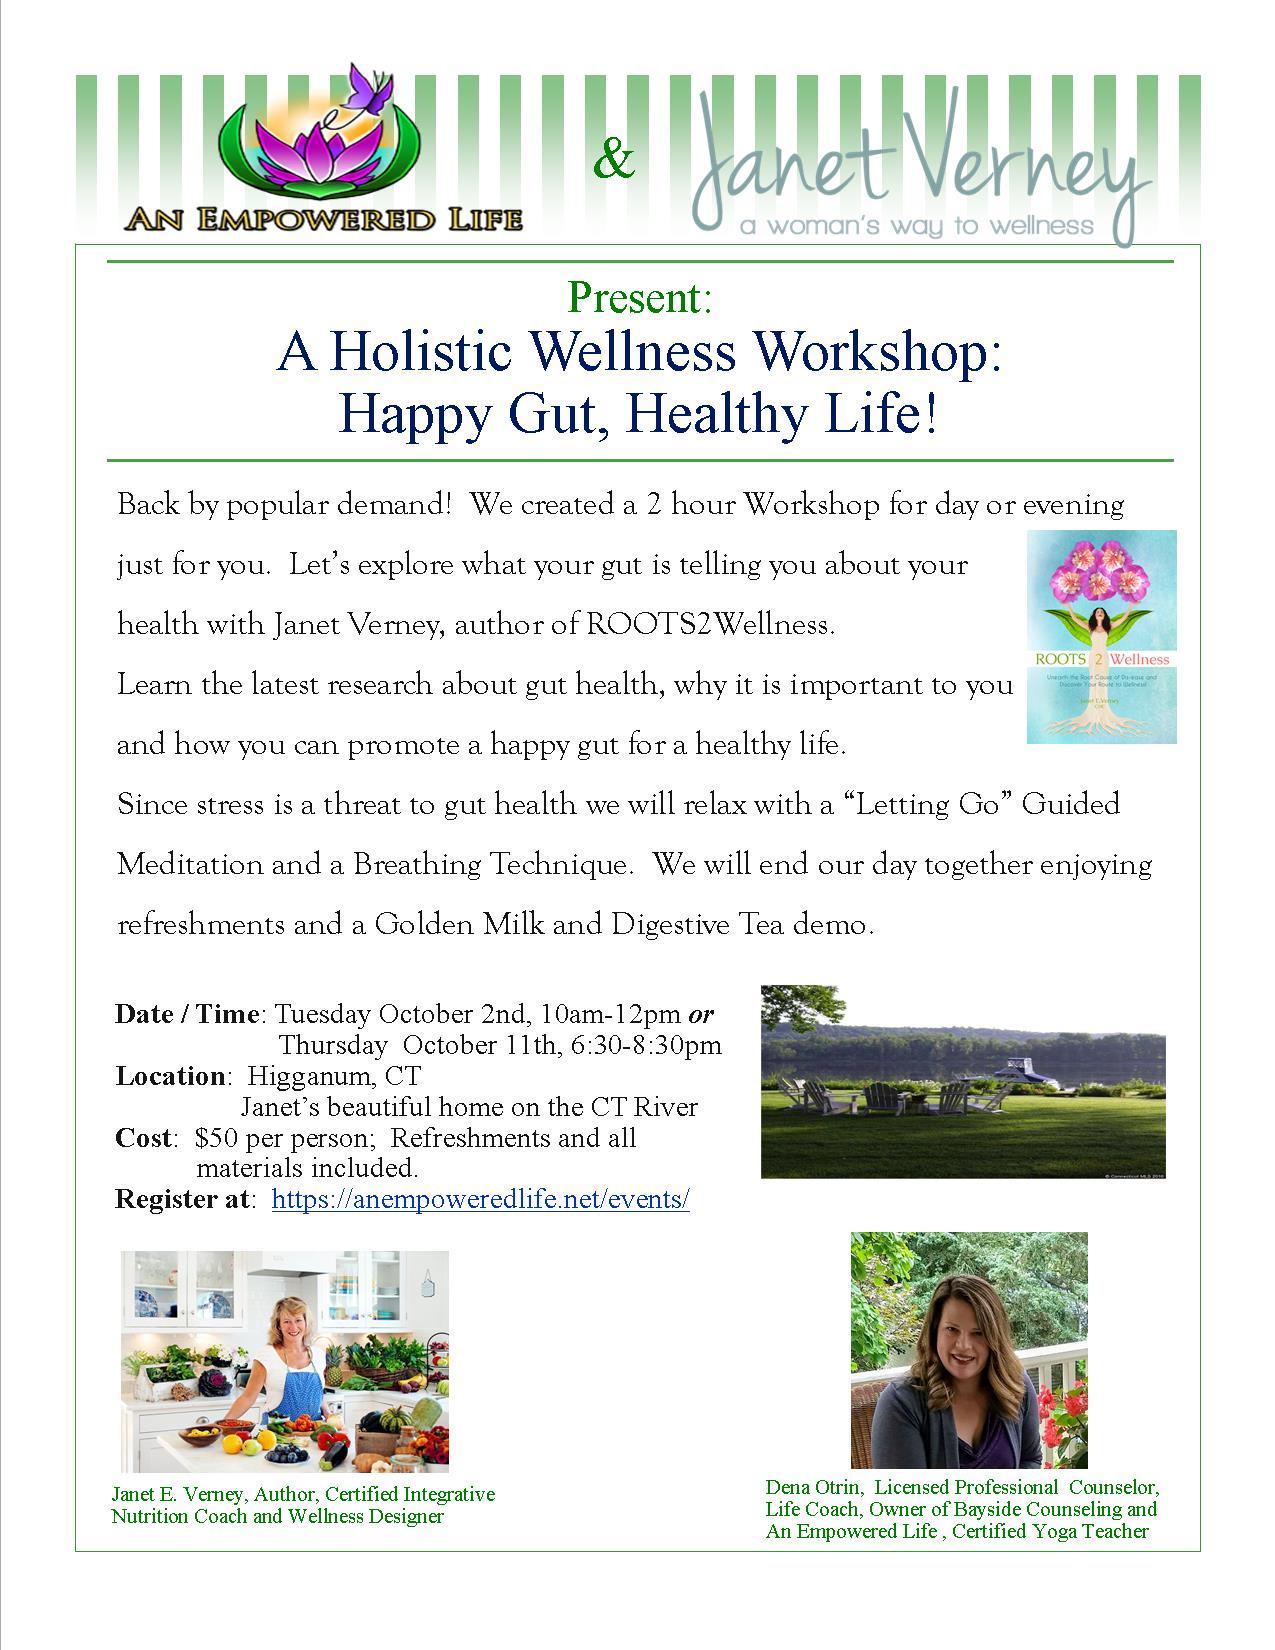 A Holistic Wellness Workshop: Happy Gut, Healthy Life